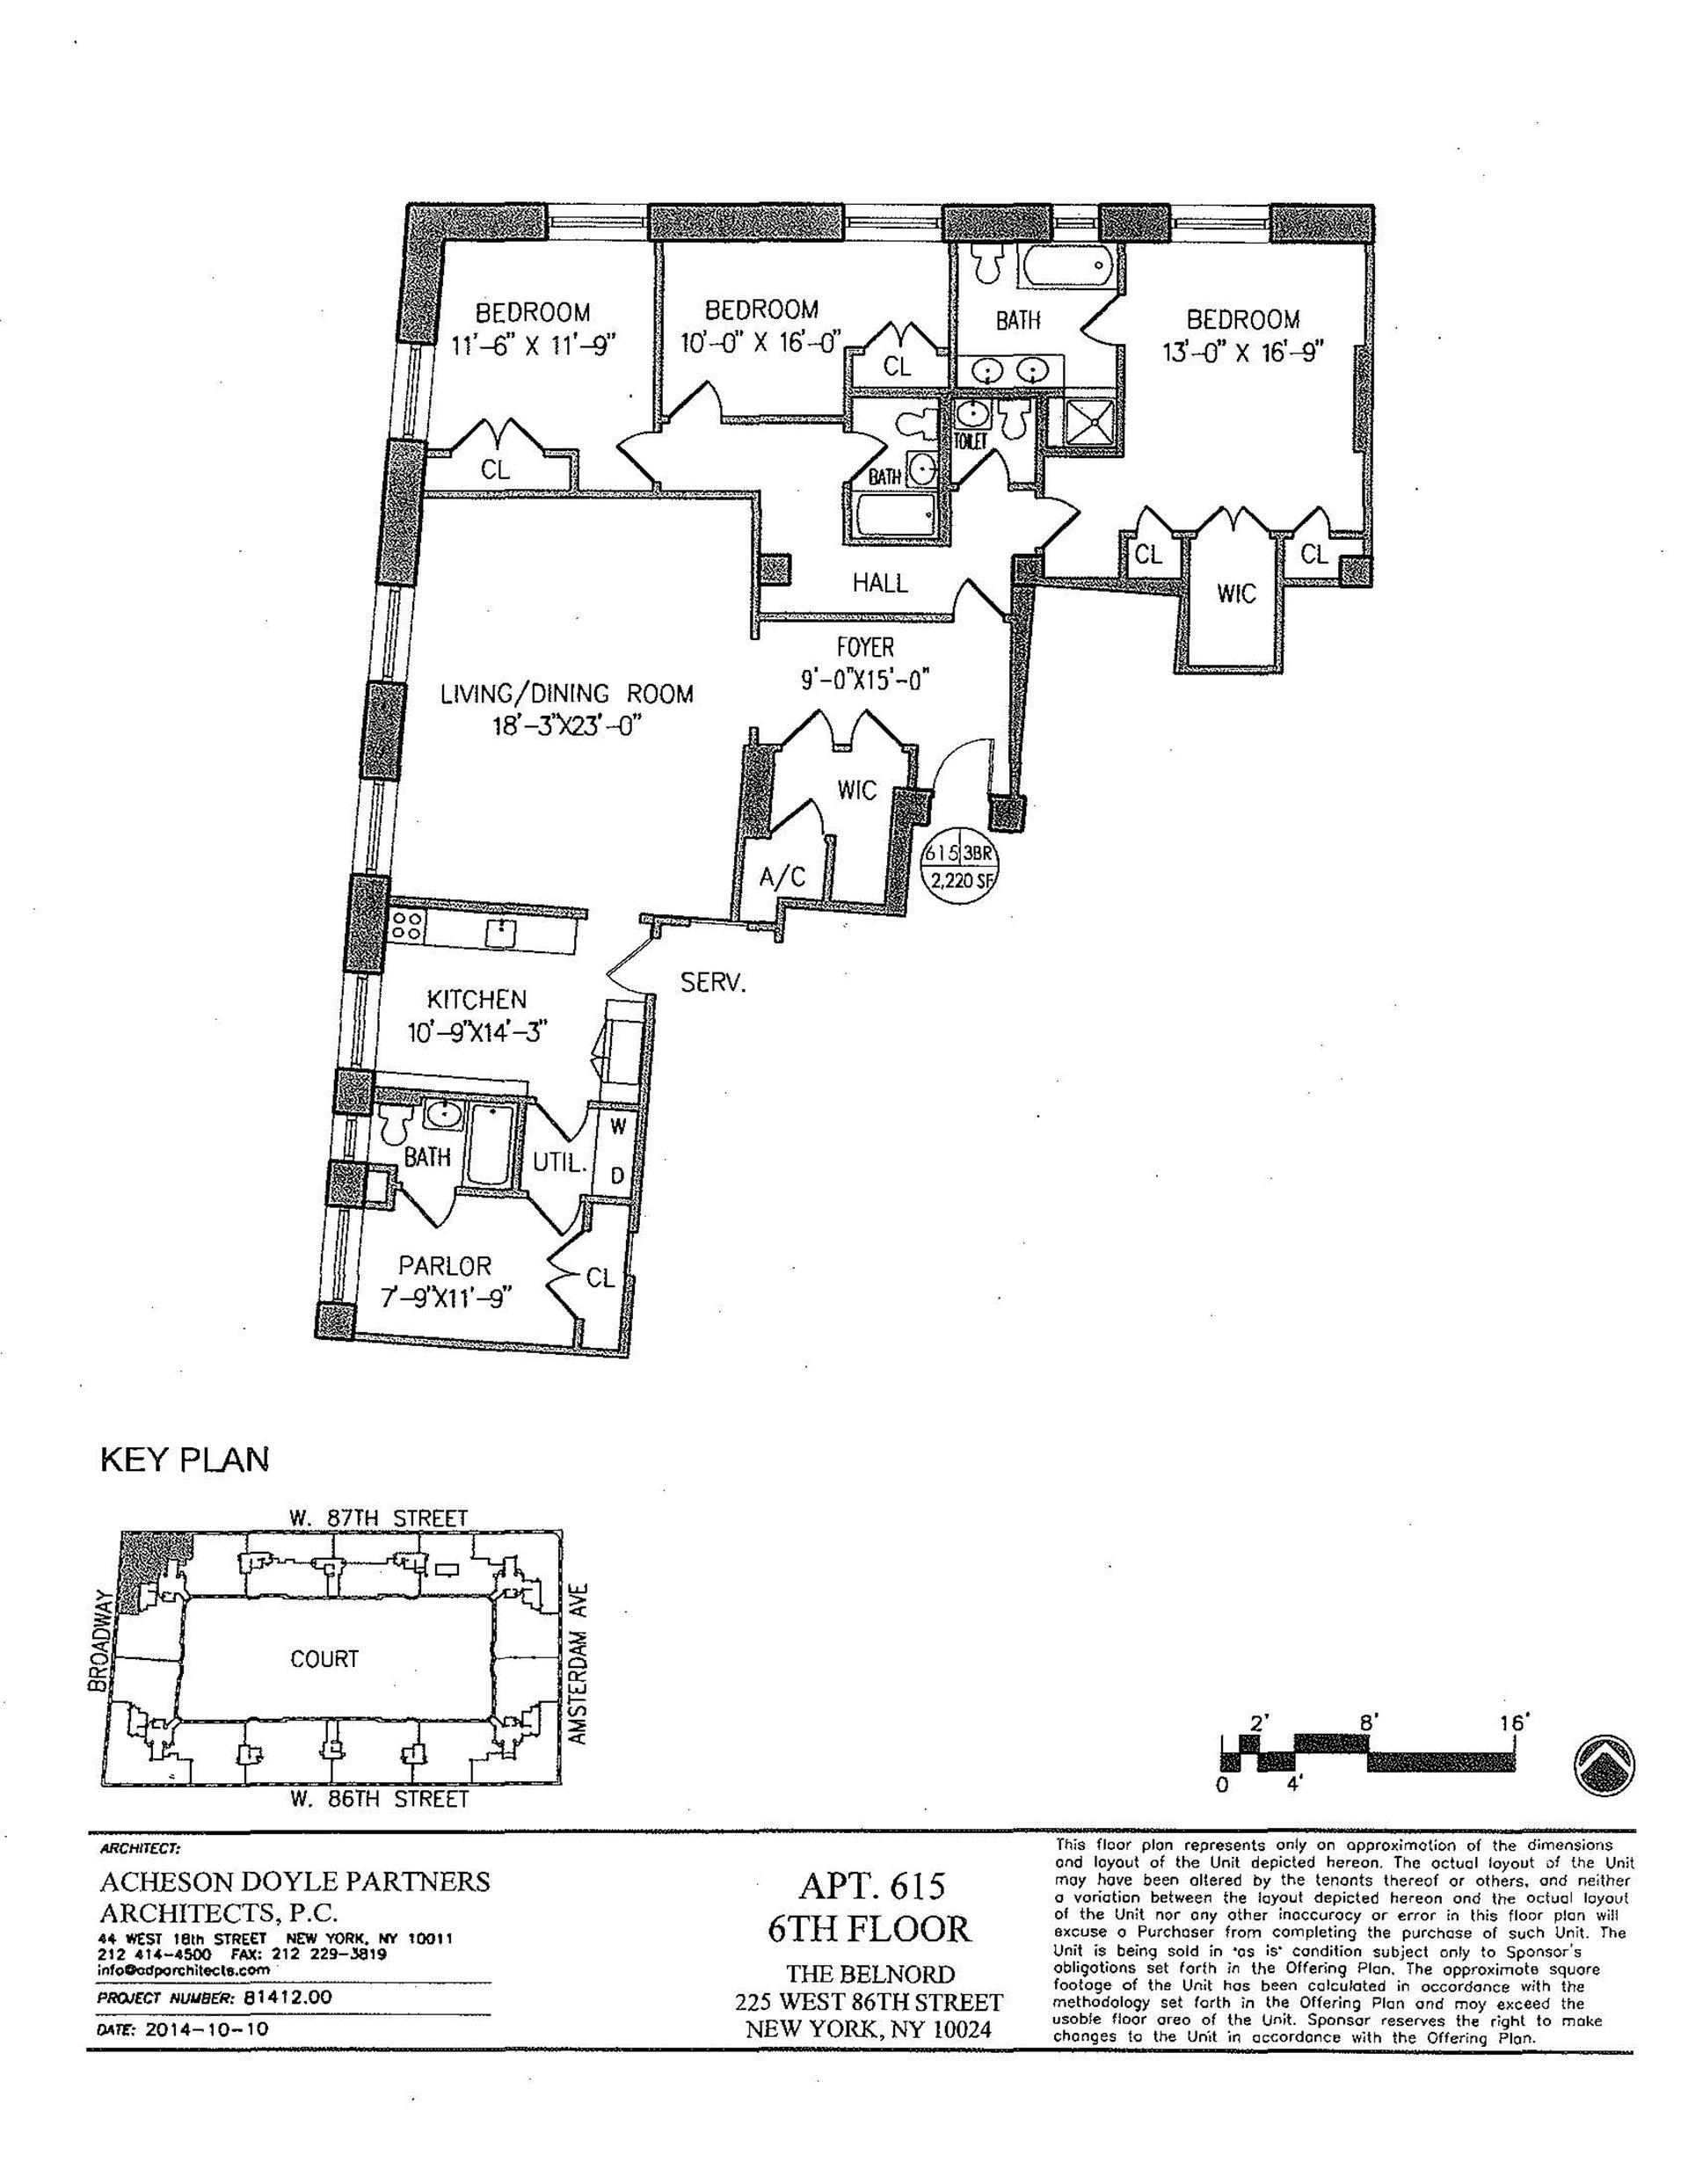 Floor plan of The Belnord, 225 West 86th Street, 615 - Upper West Side, New York